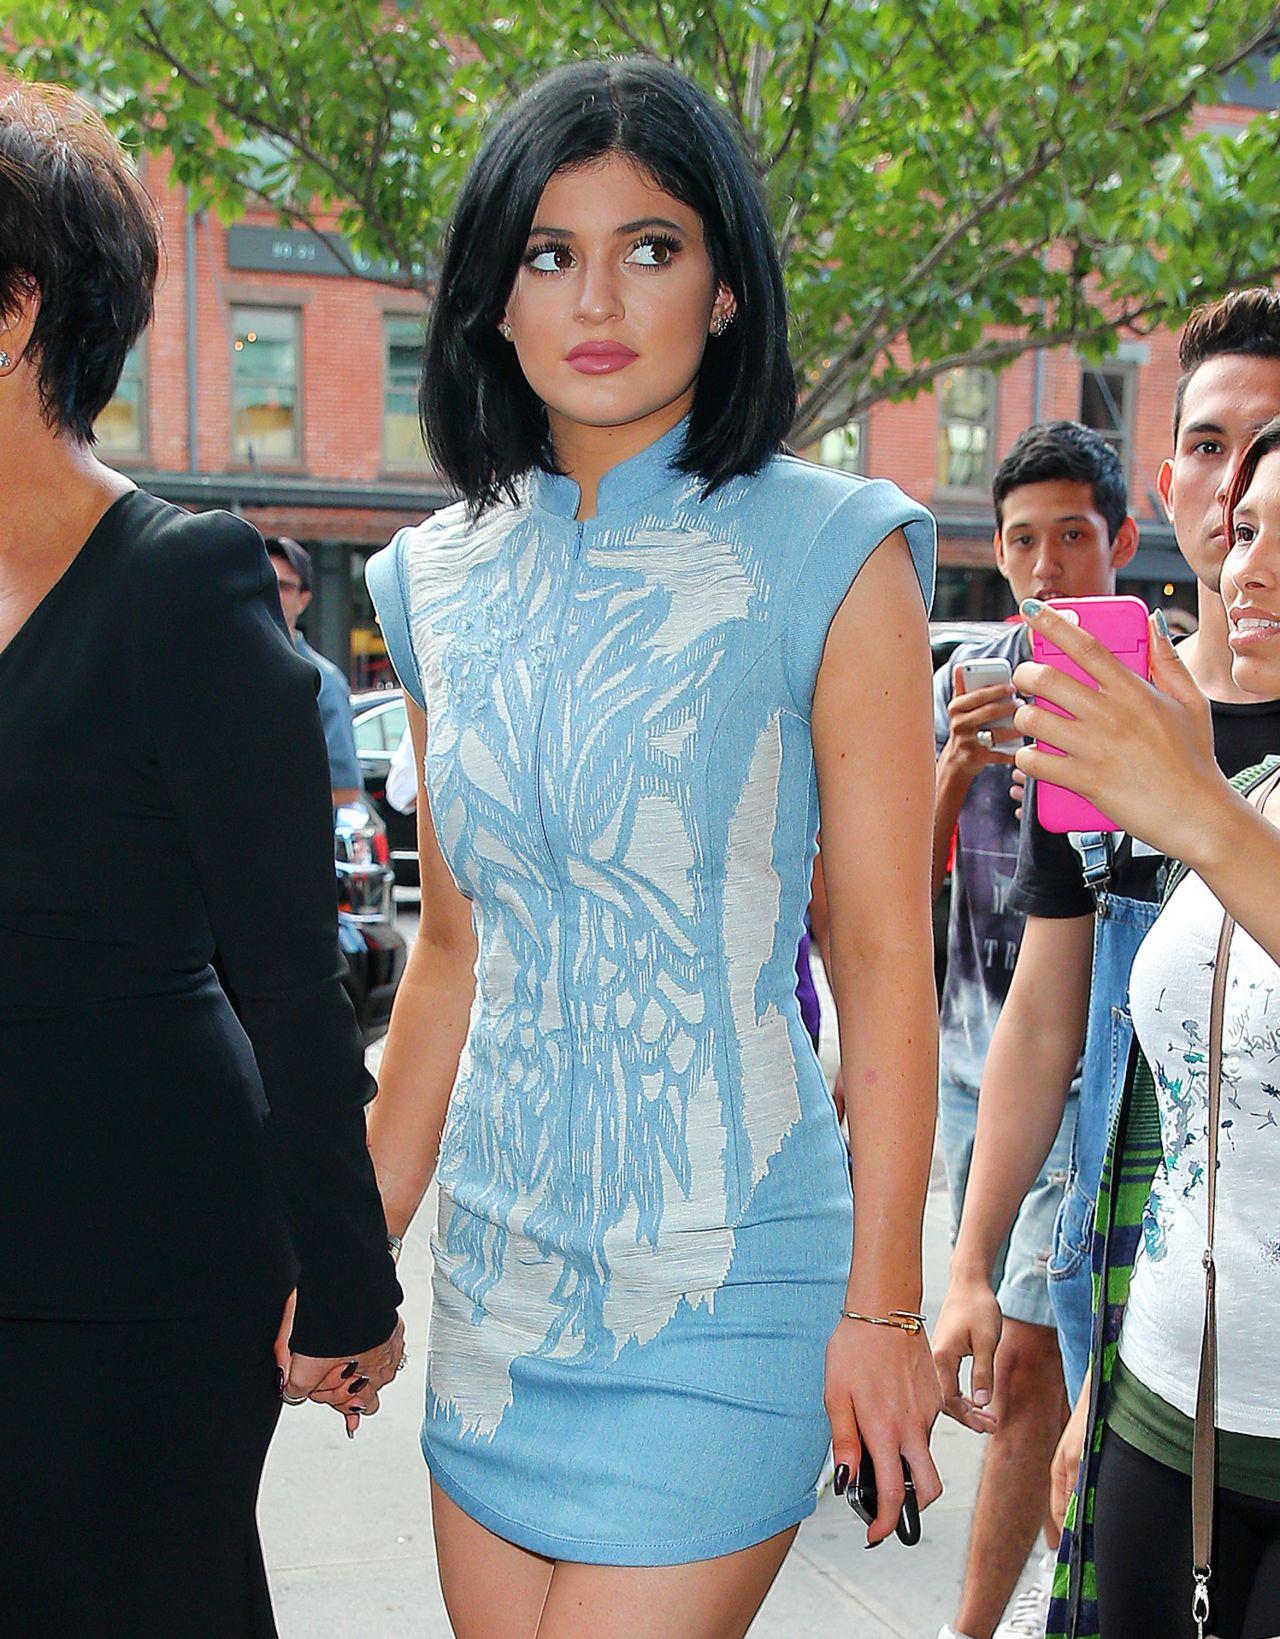 New Kylie Summer Lip Kit Swatches On Dark Skin: Leaving Her Hotel In New York